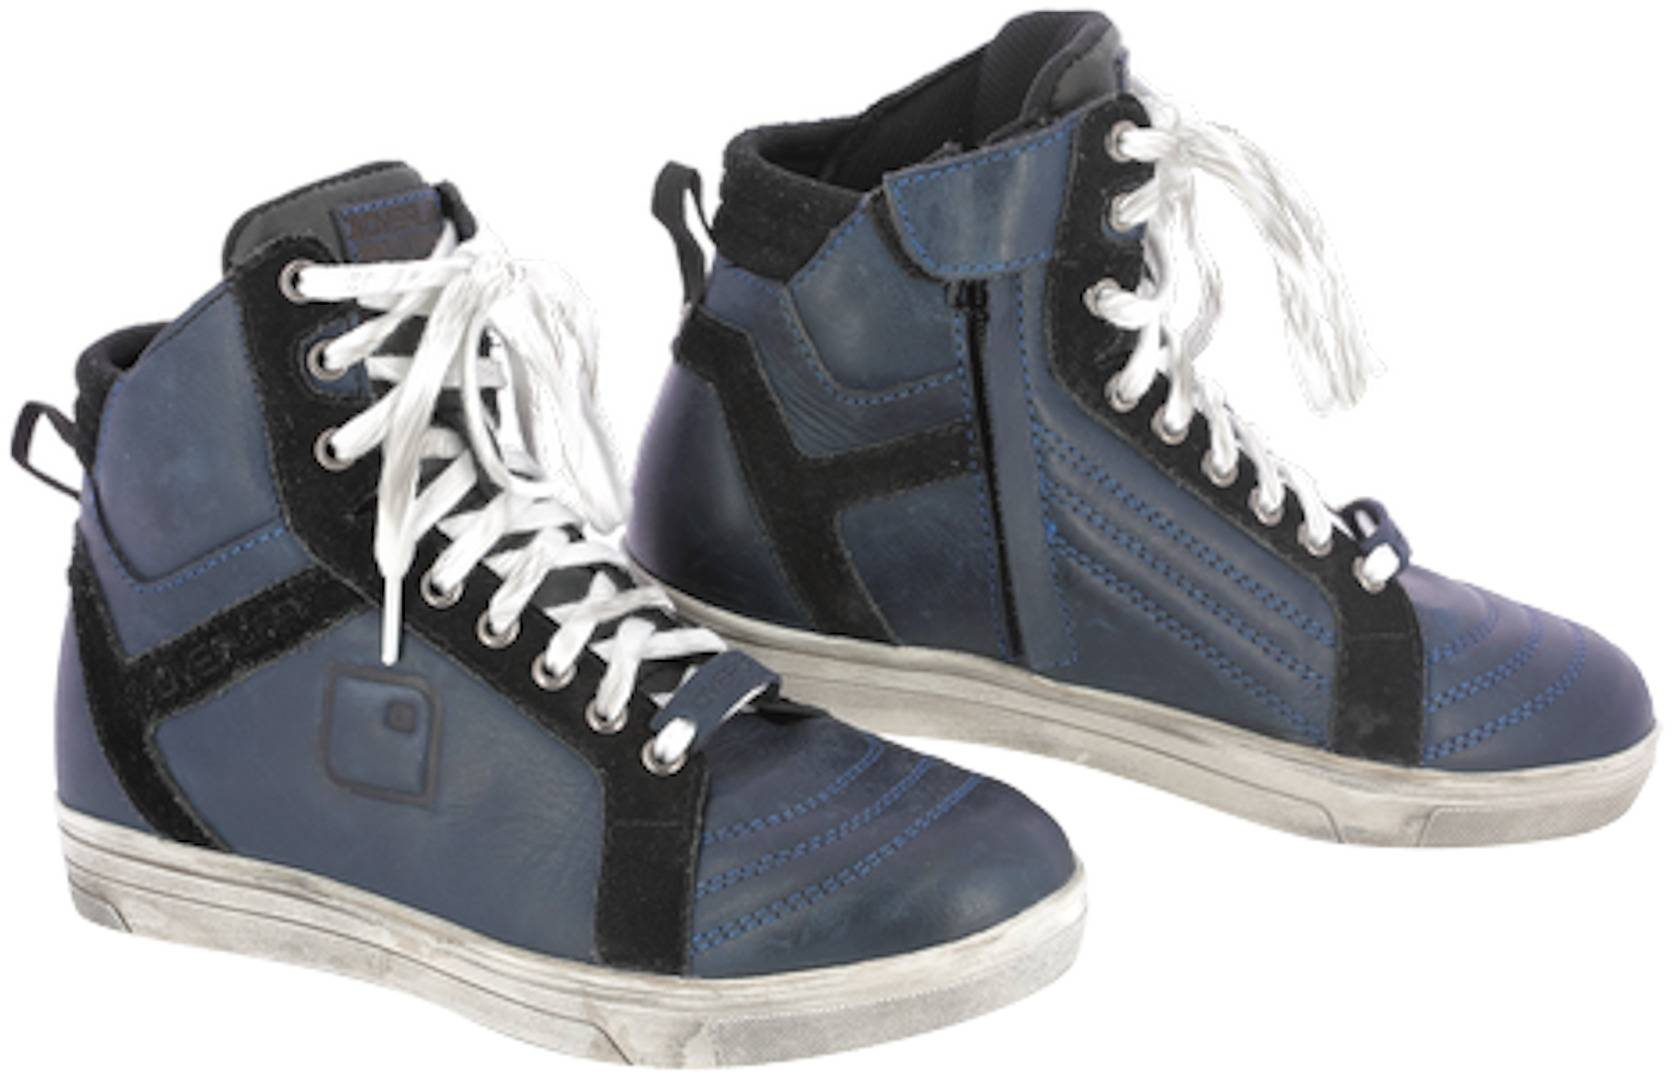 Overlap Toran Motorcycle Shoes Black Blue 37